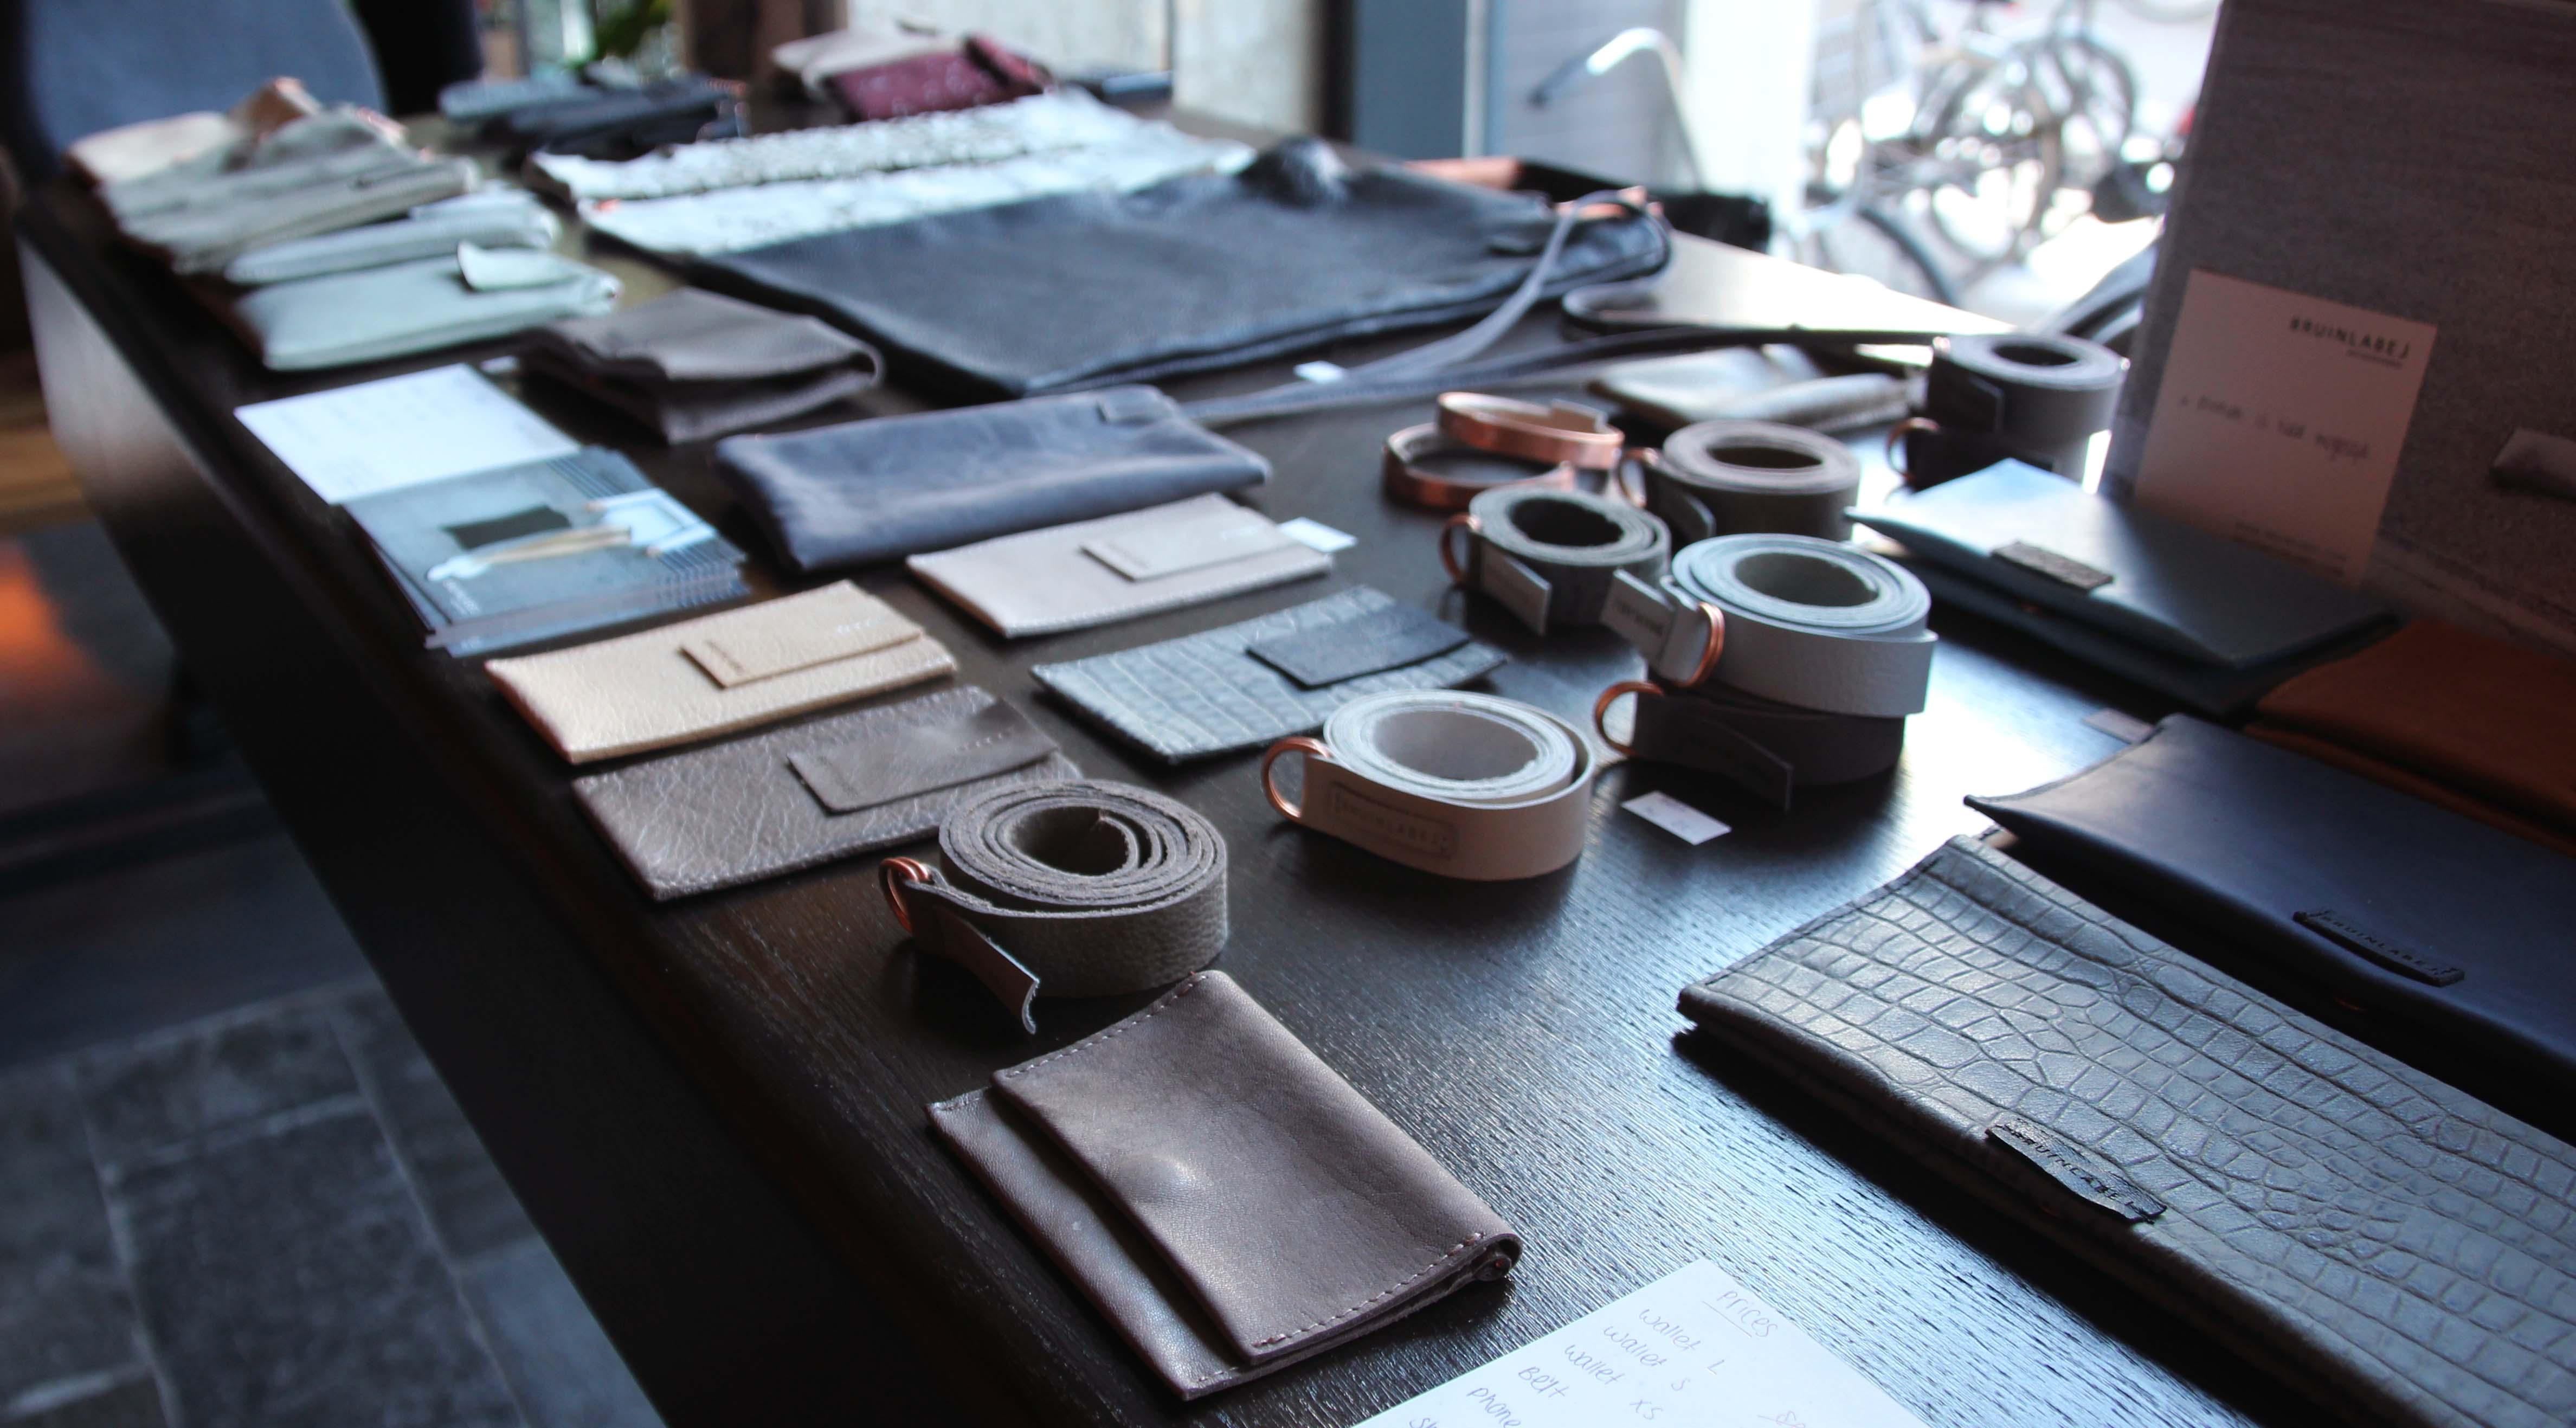 Bag at You - Mood Bruinlabel Bags - Fashionweek